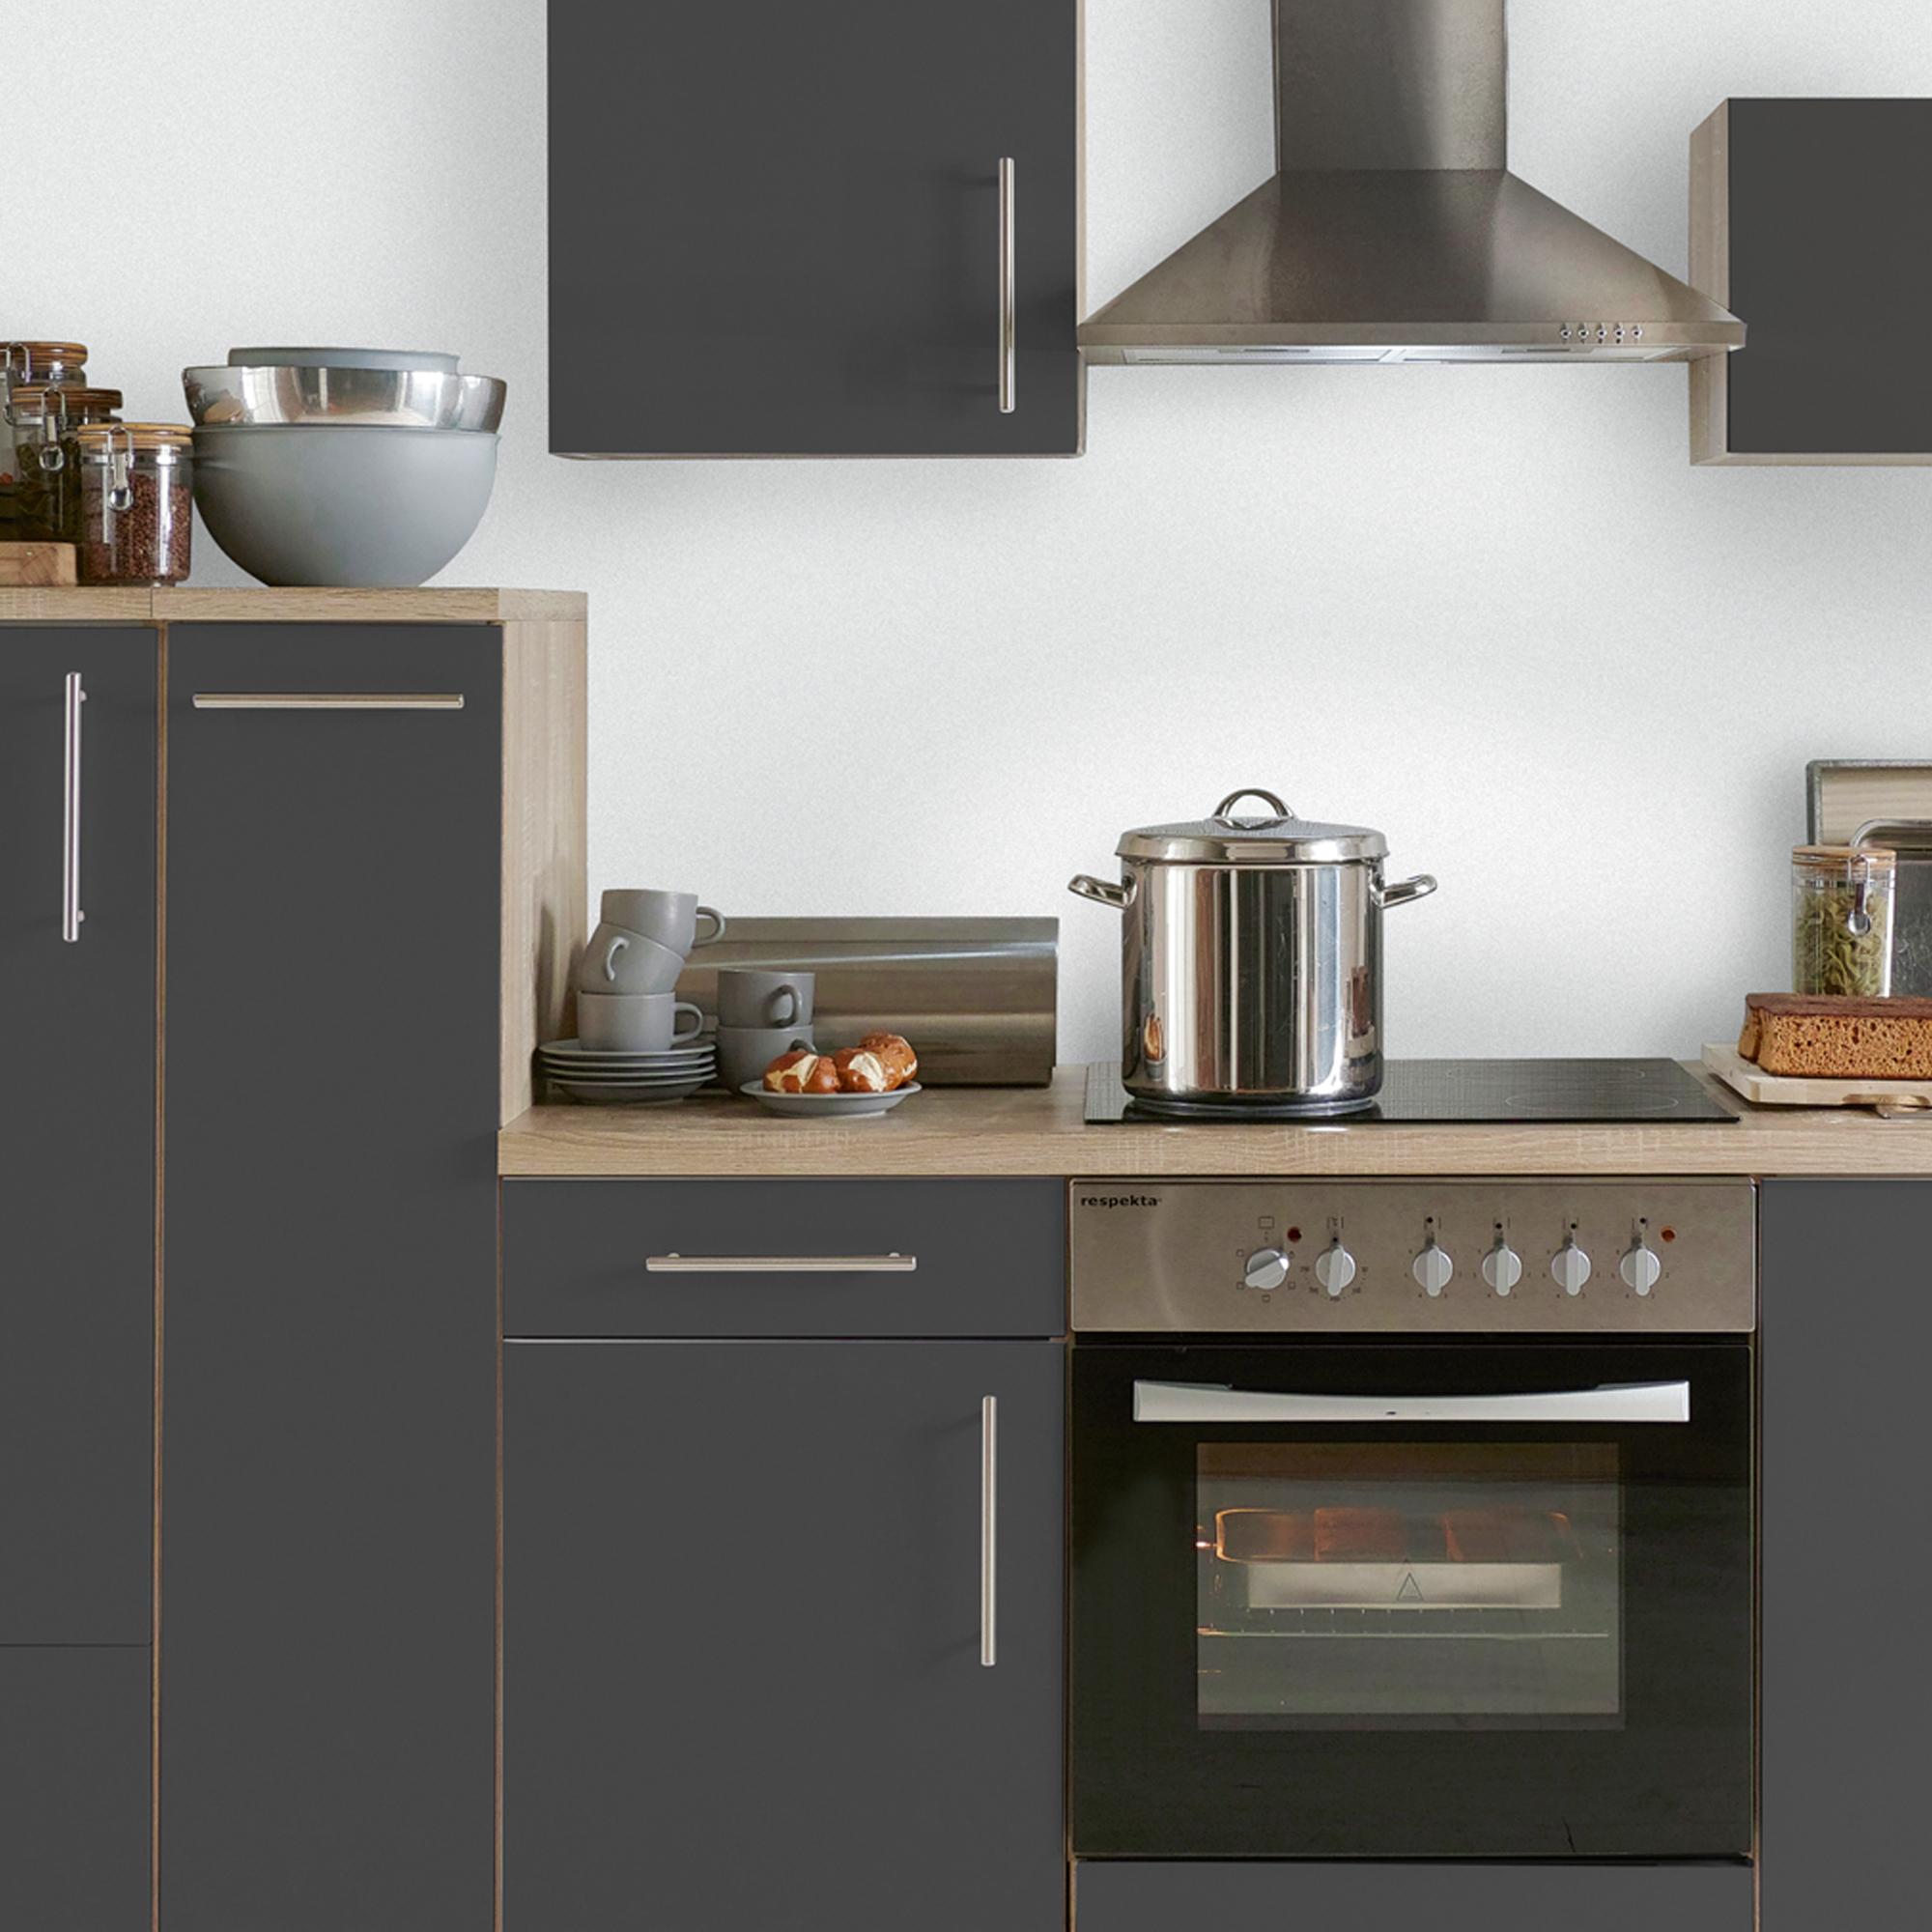 k chenzeile stockholm k che mit e ger ten breite 300. Black Bedroom Furniture Sets. Home Design Ideas